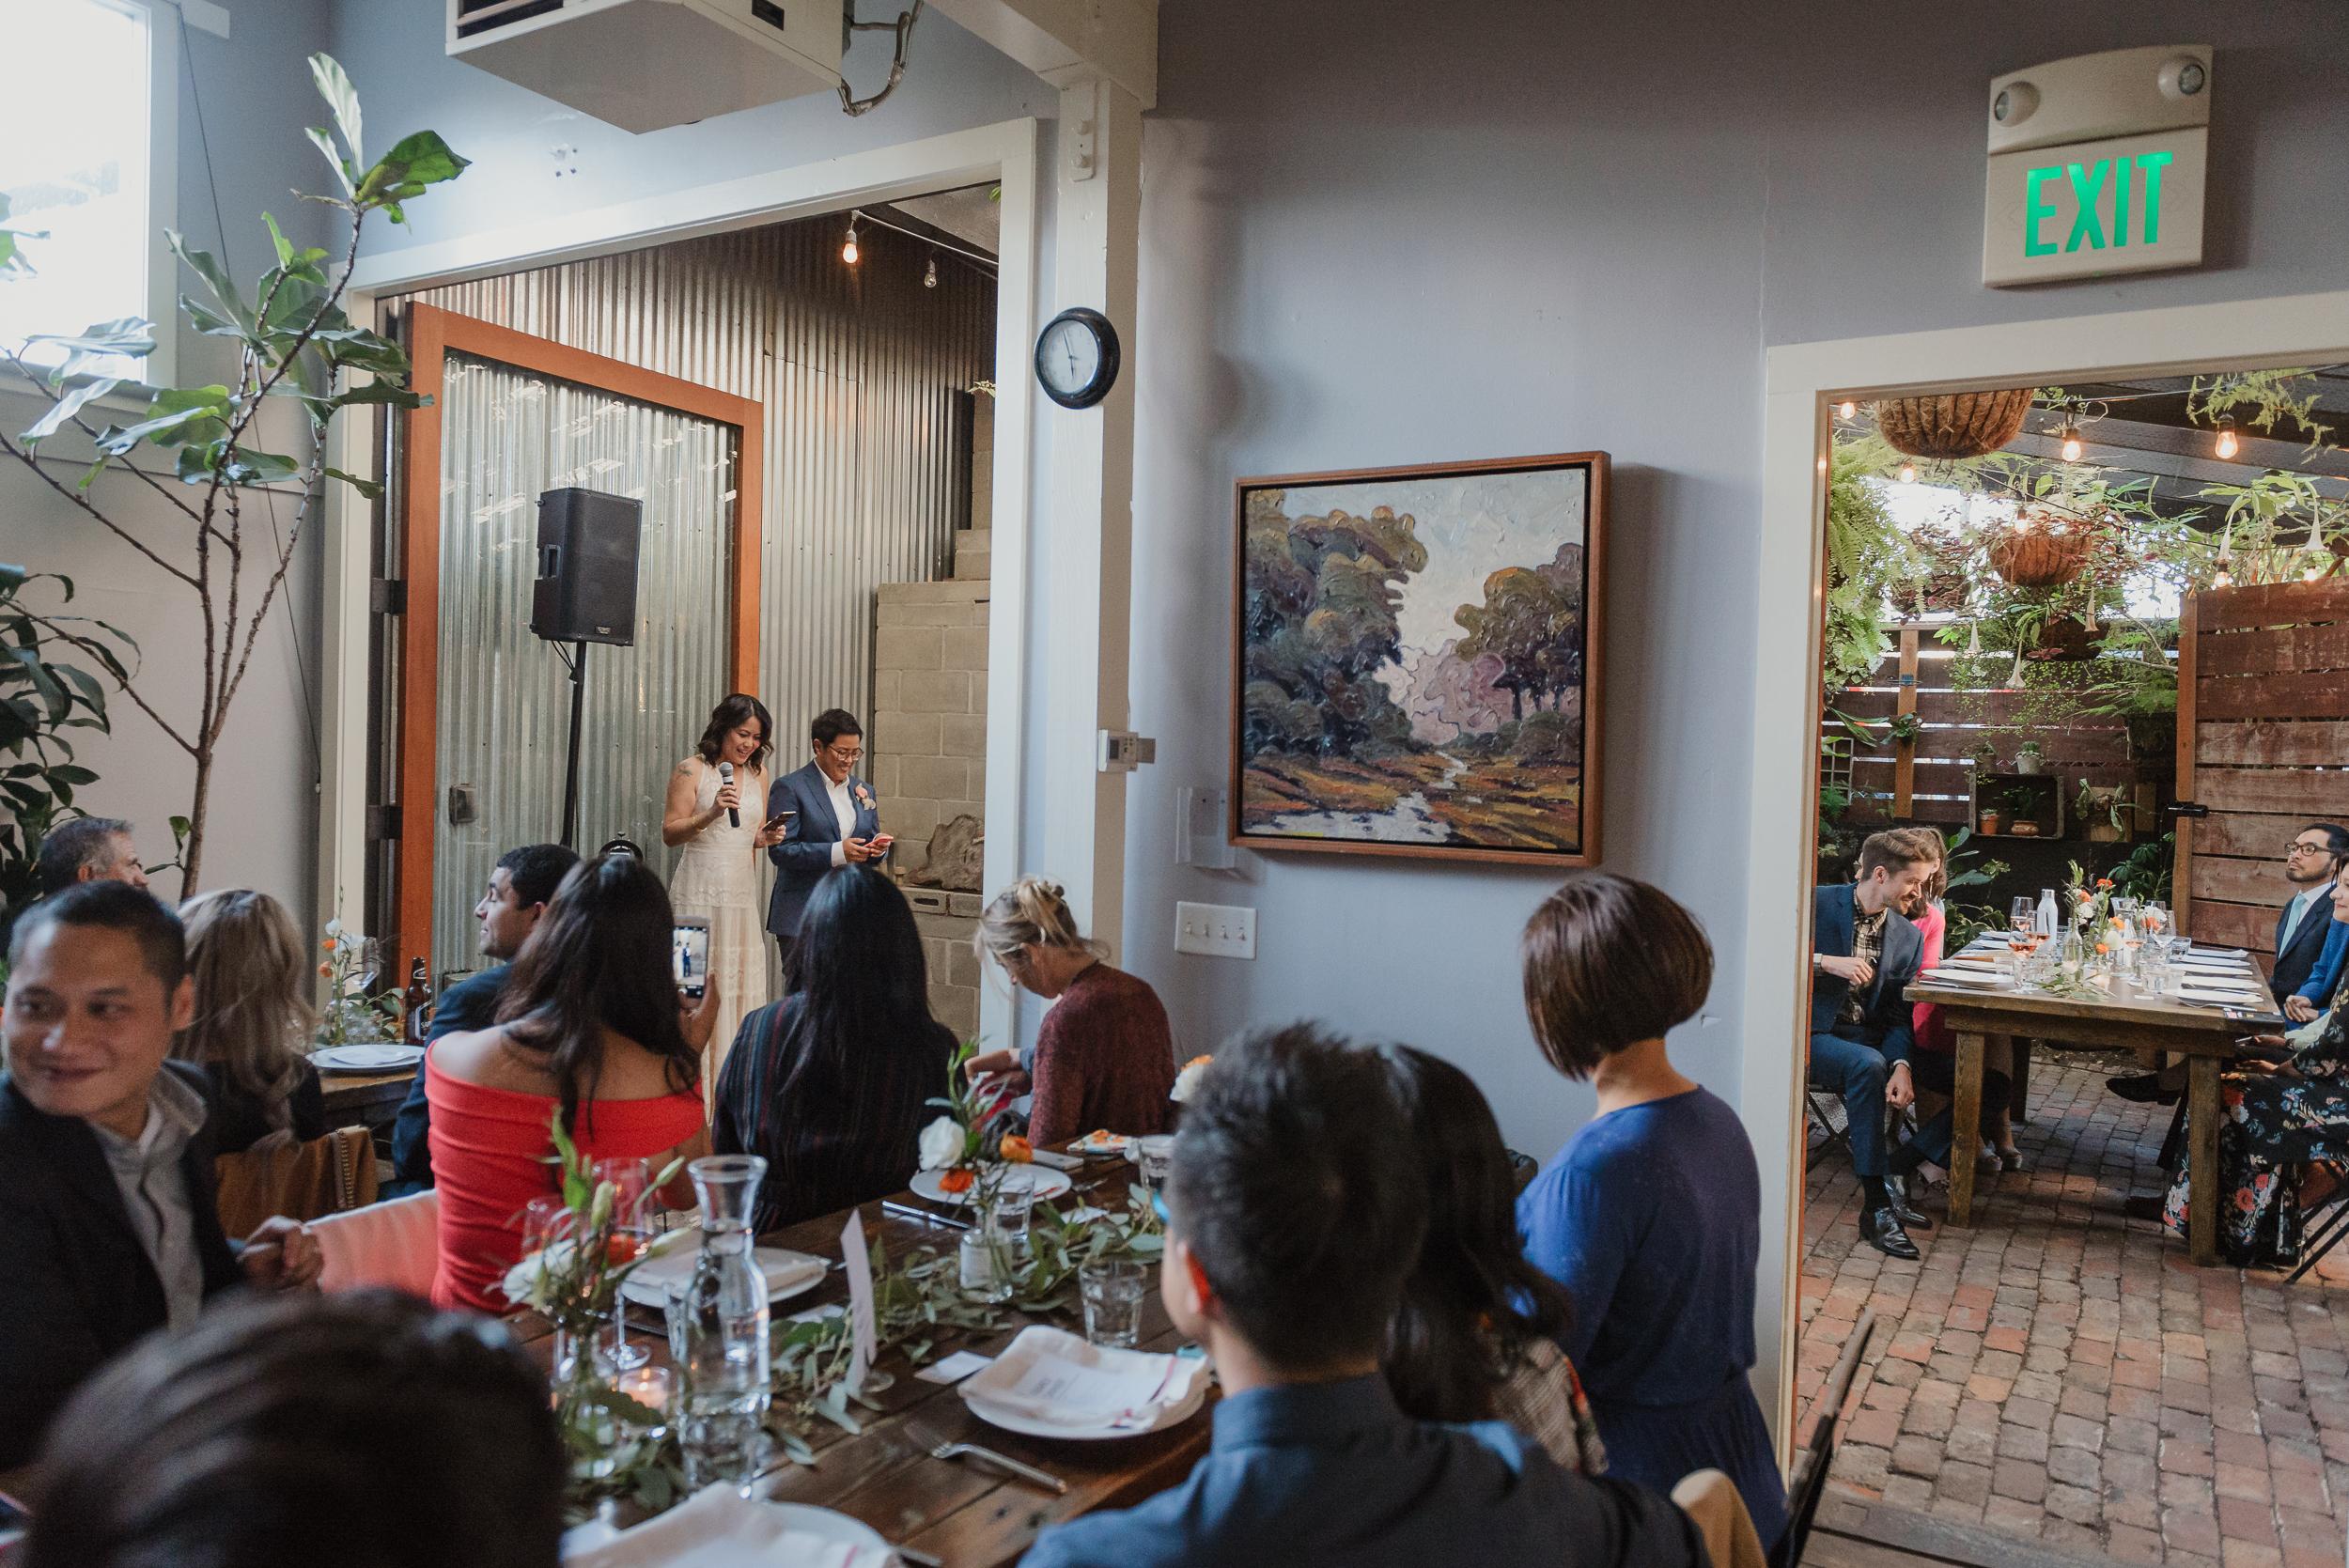 057-57-san-francisco-city-hall-stable-cafe-wedding-vivianchen-406.jpg